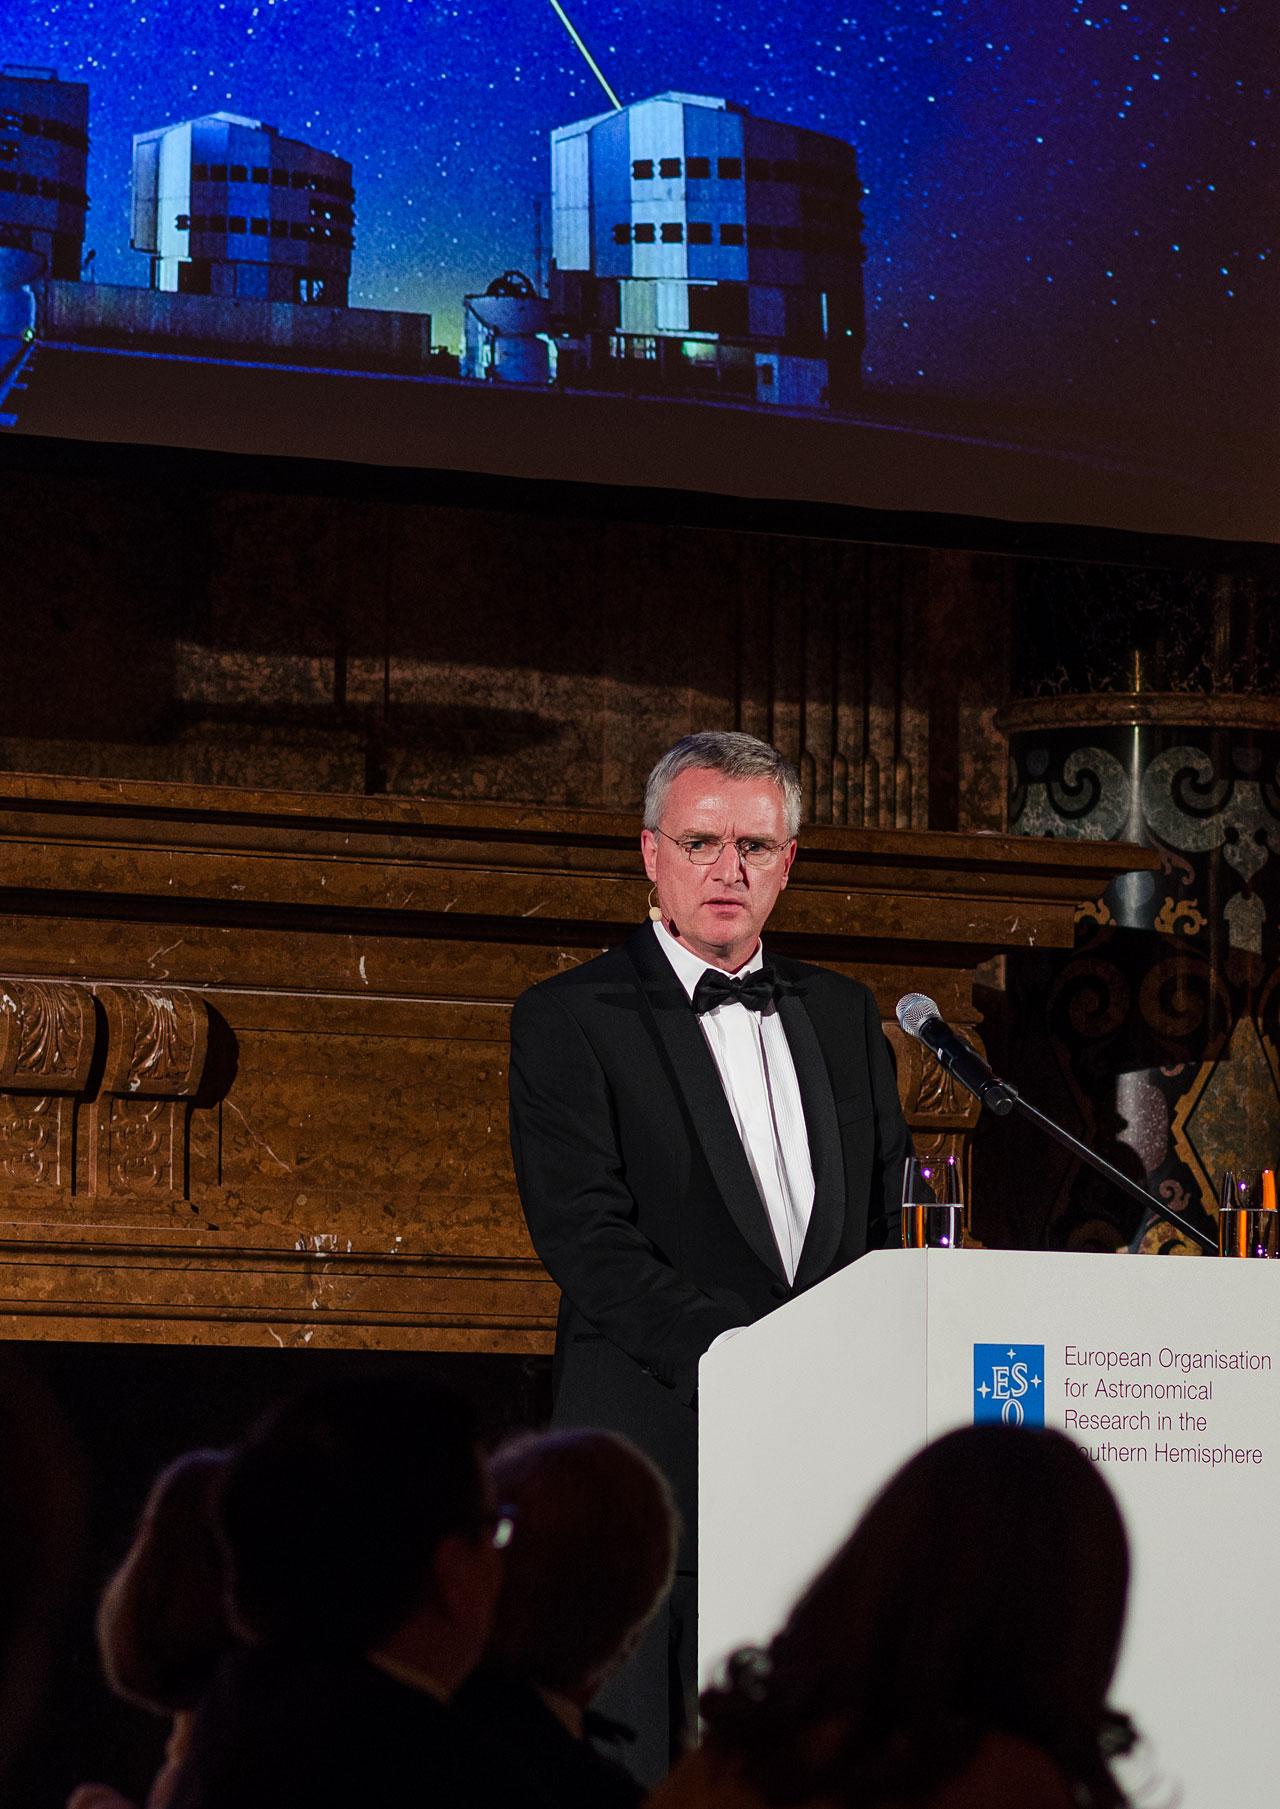 Tim de Zeeuw at the ESO 50th Anniversary Gala Event